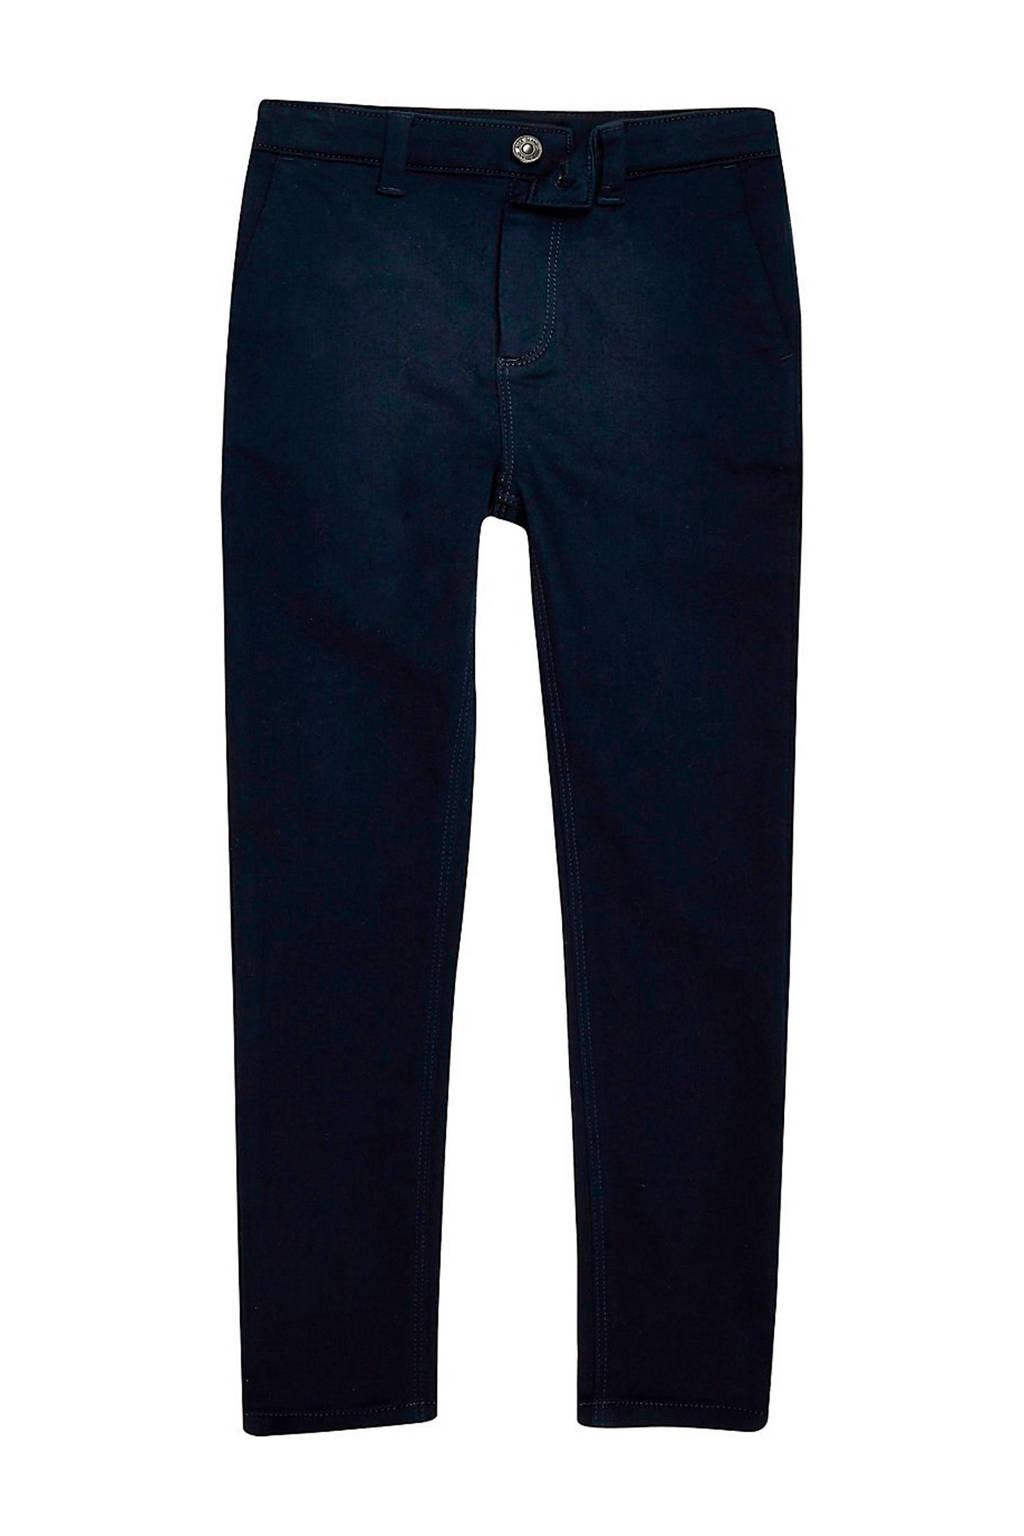 River Island slim fit jeans, Dark denim